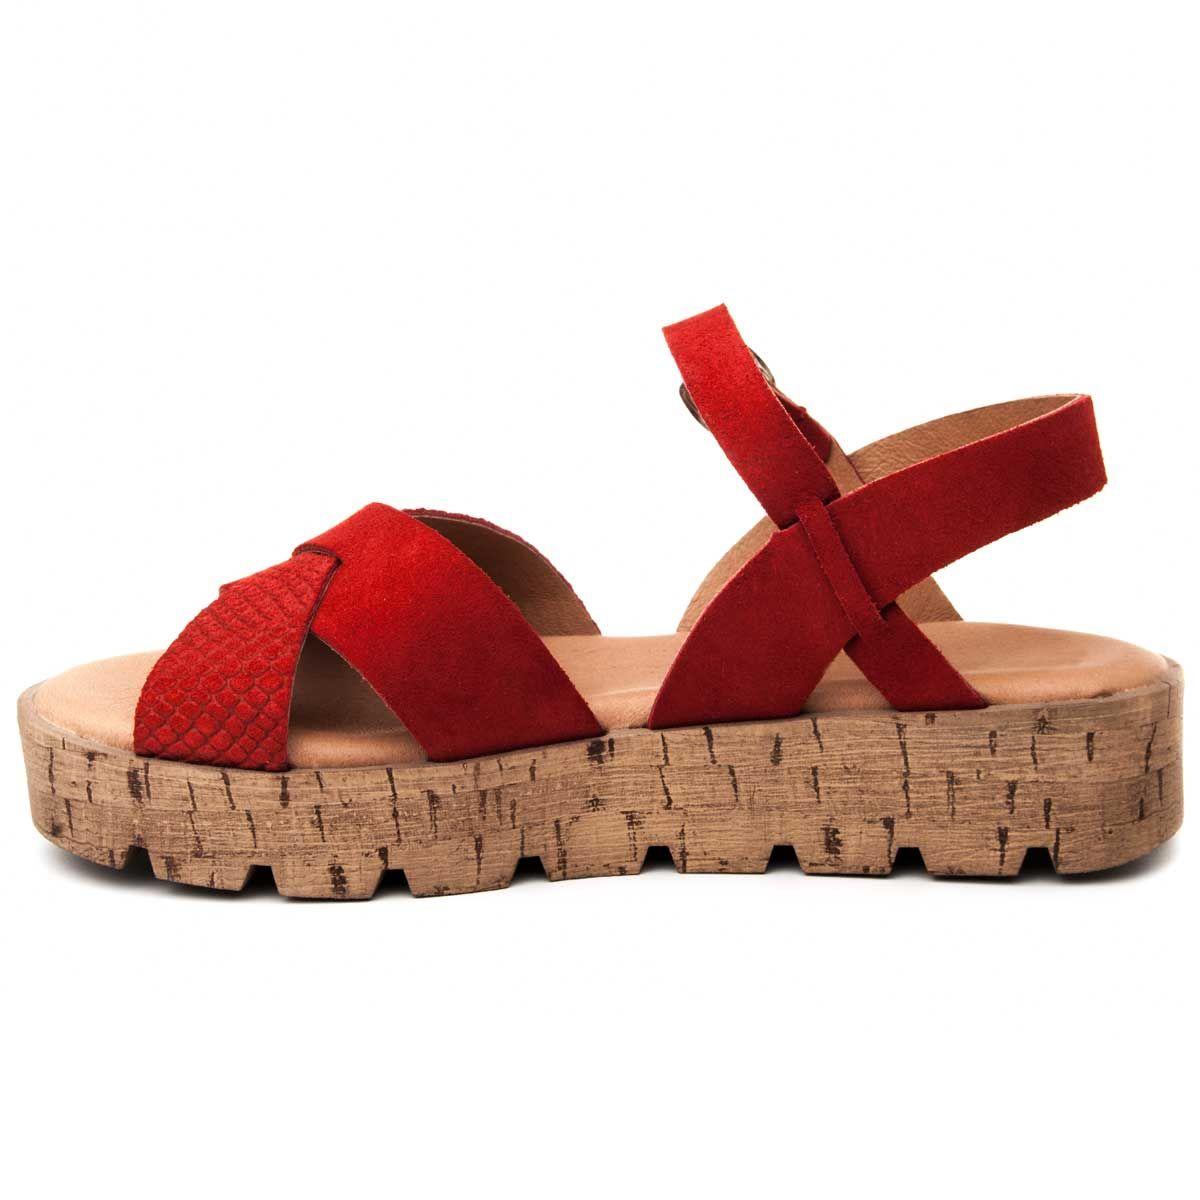 Purapiel Cross Strap Chunky Sandal in Red